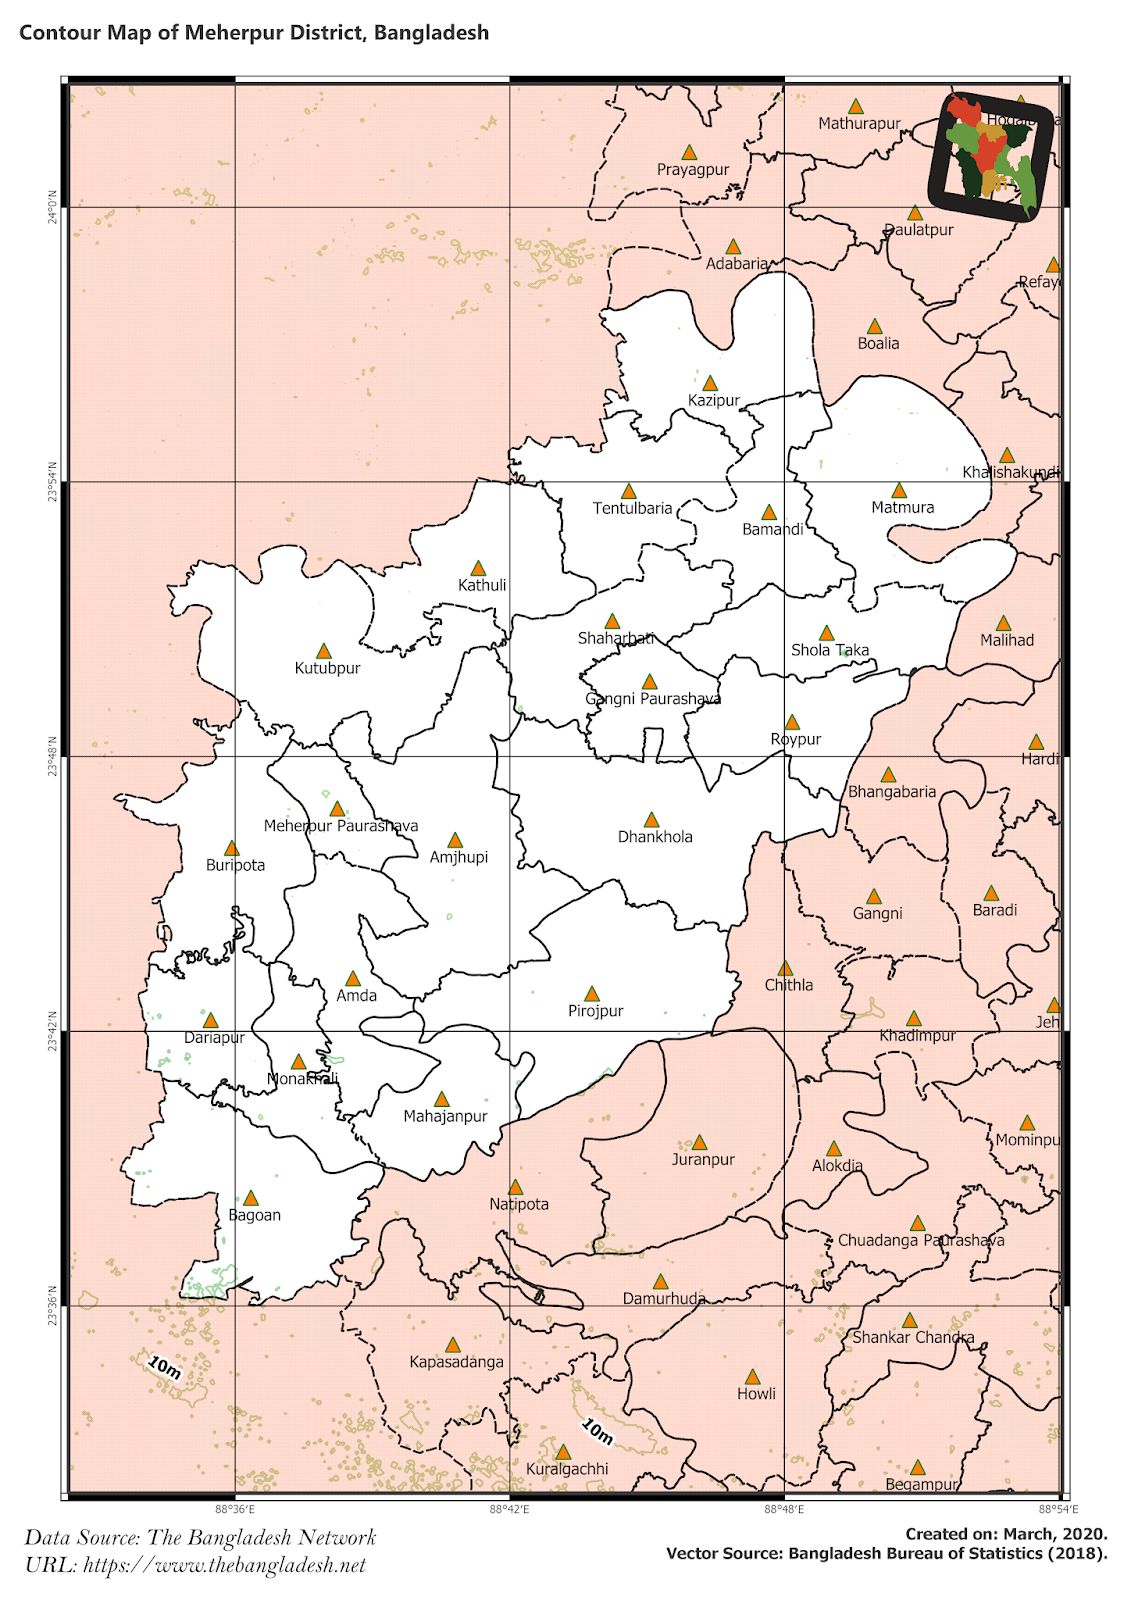 Elevation Map of Meherpur District of Bangladesh